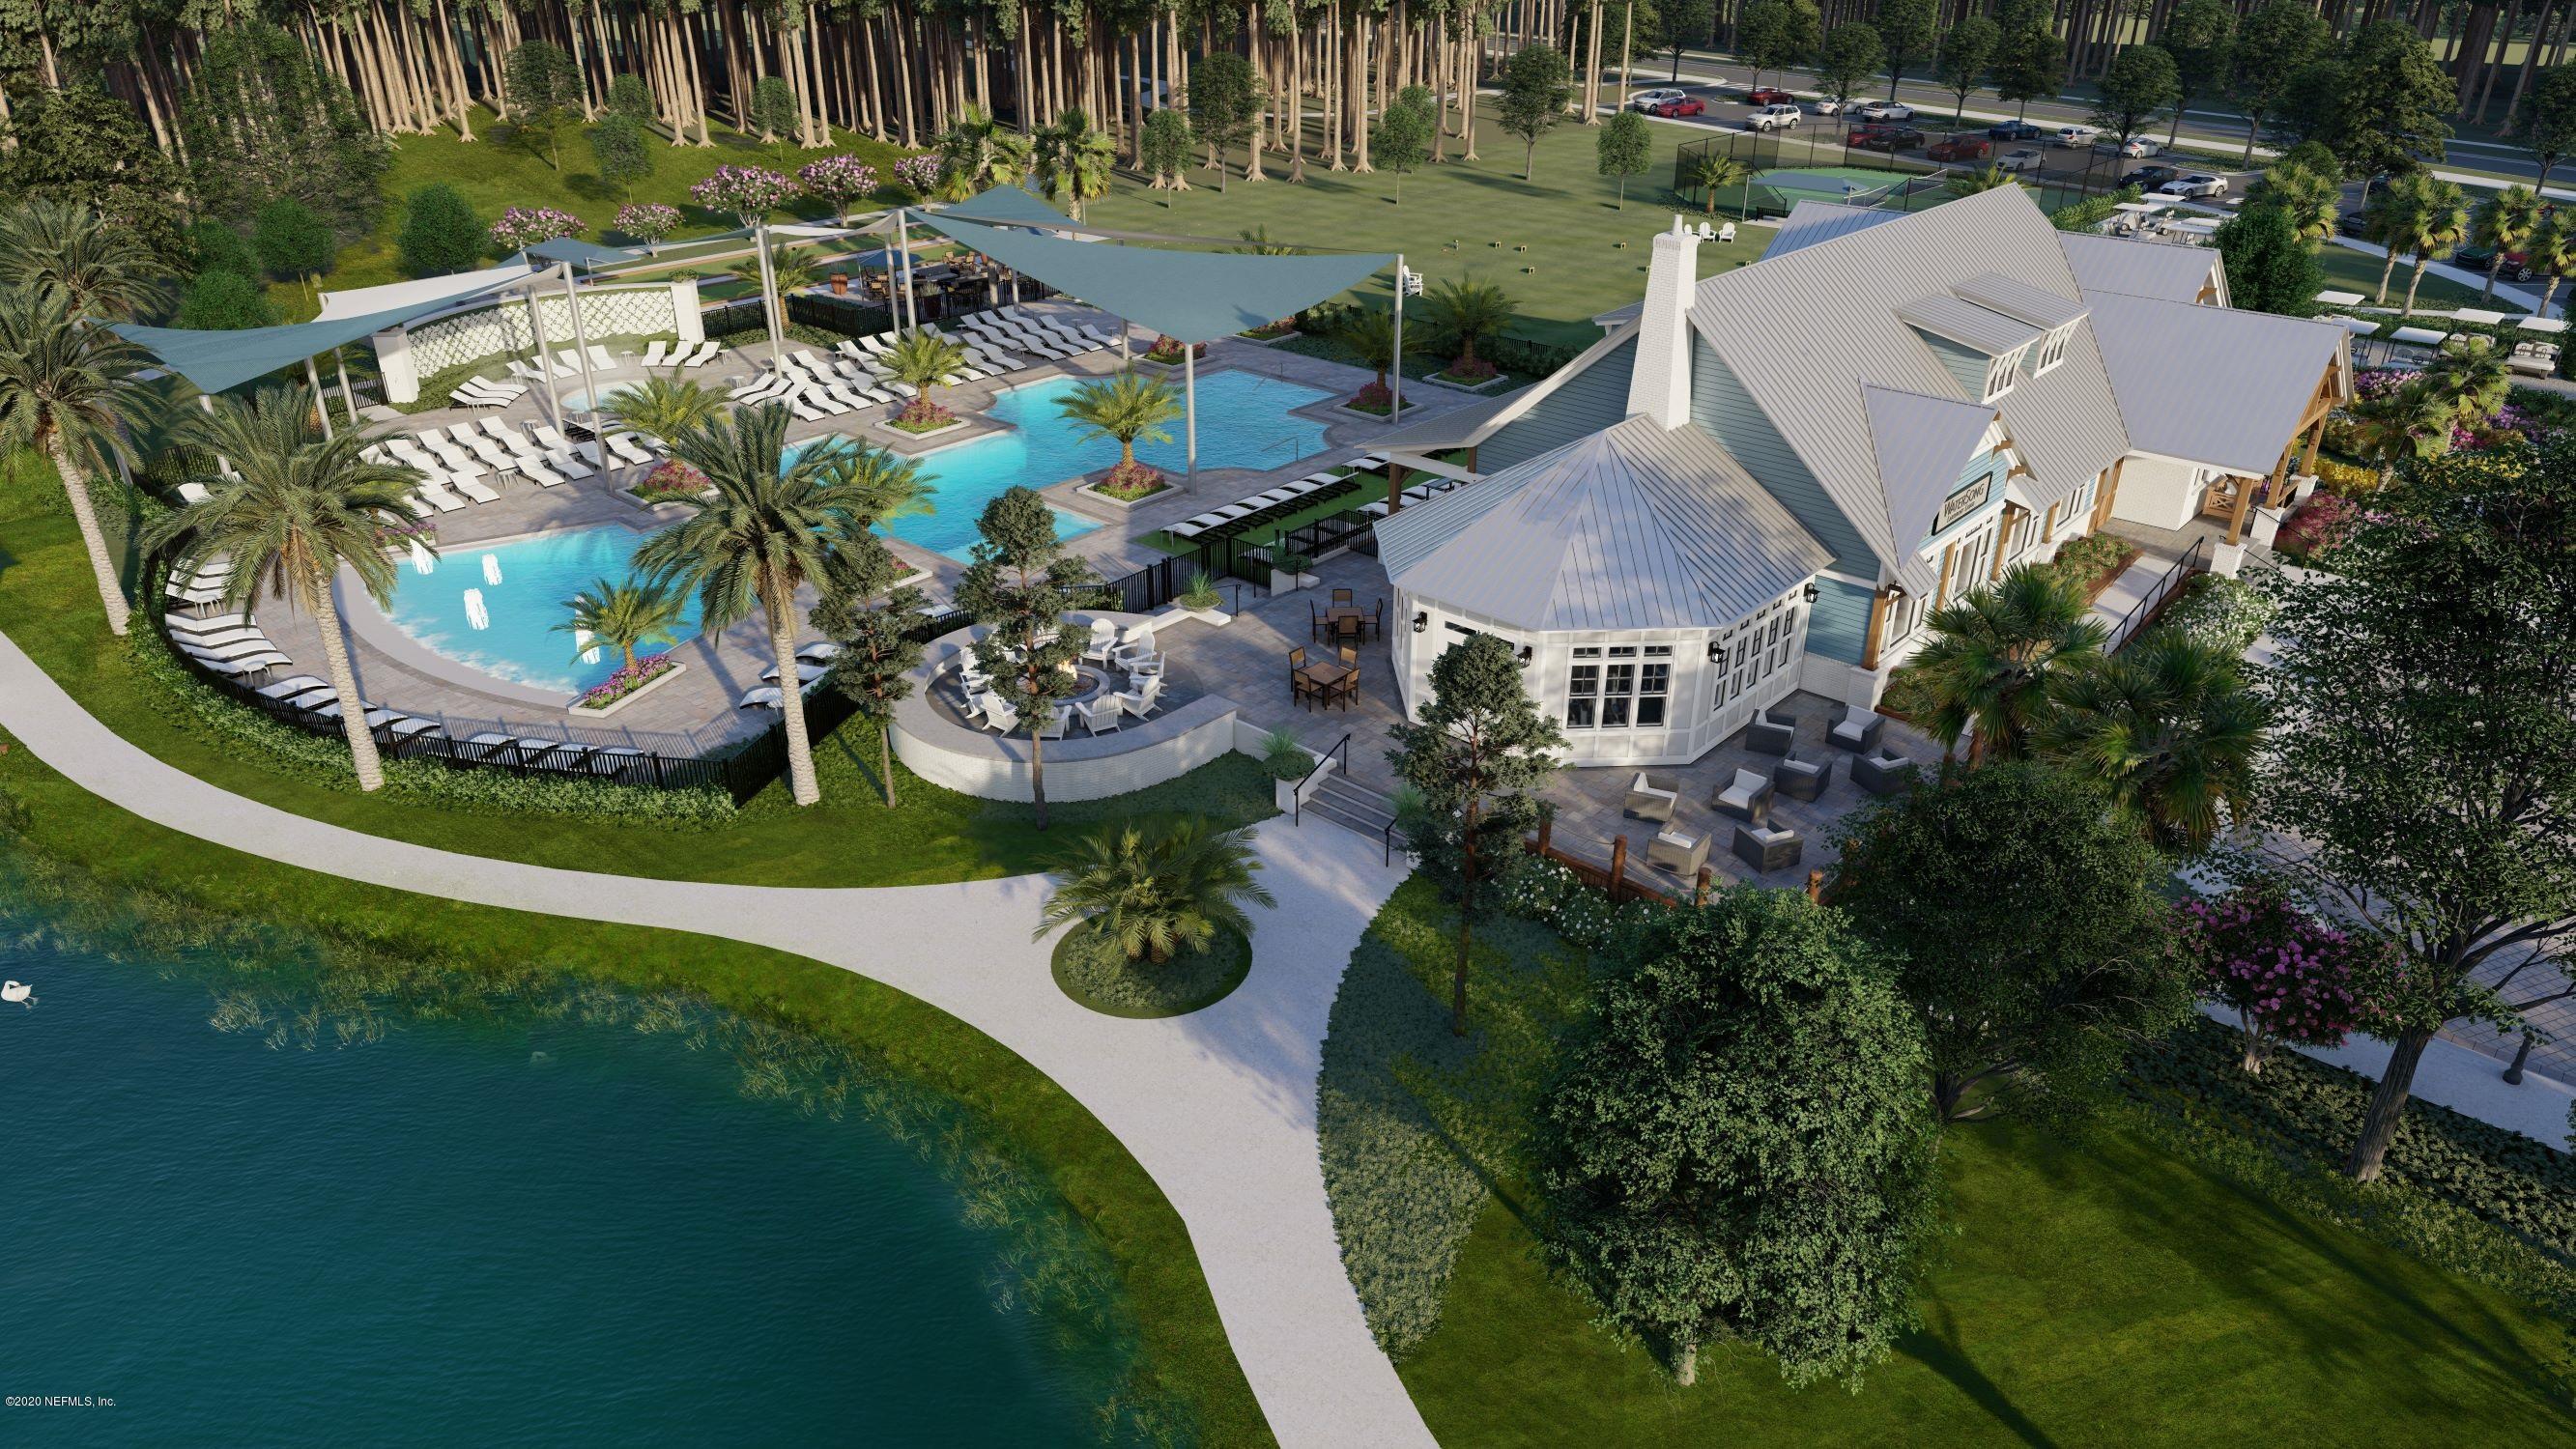 299 KELLET WAY, ST JOHNS, FLORIDA 32259, 2 Bedrooms Bedrooms, ,2 BathroomsBathrooms,Residential,For sale,KELLET WAY,1037022